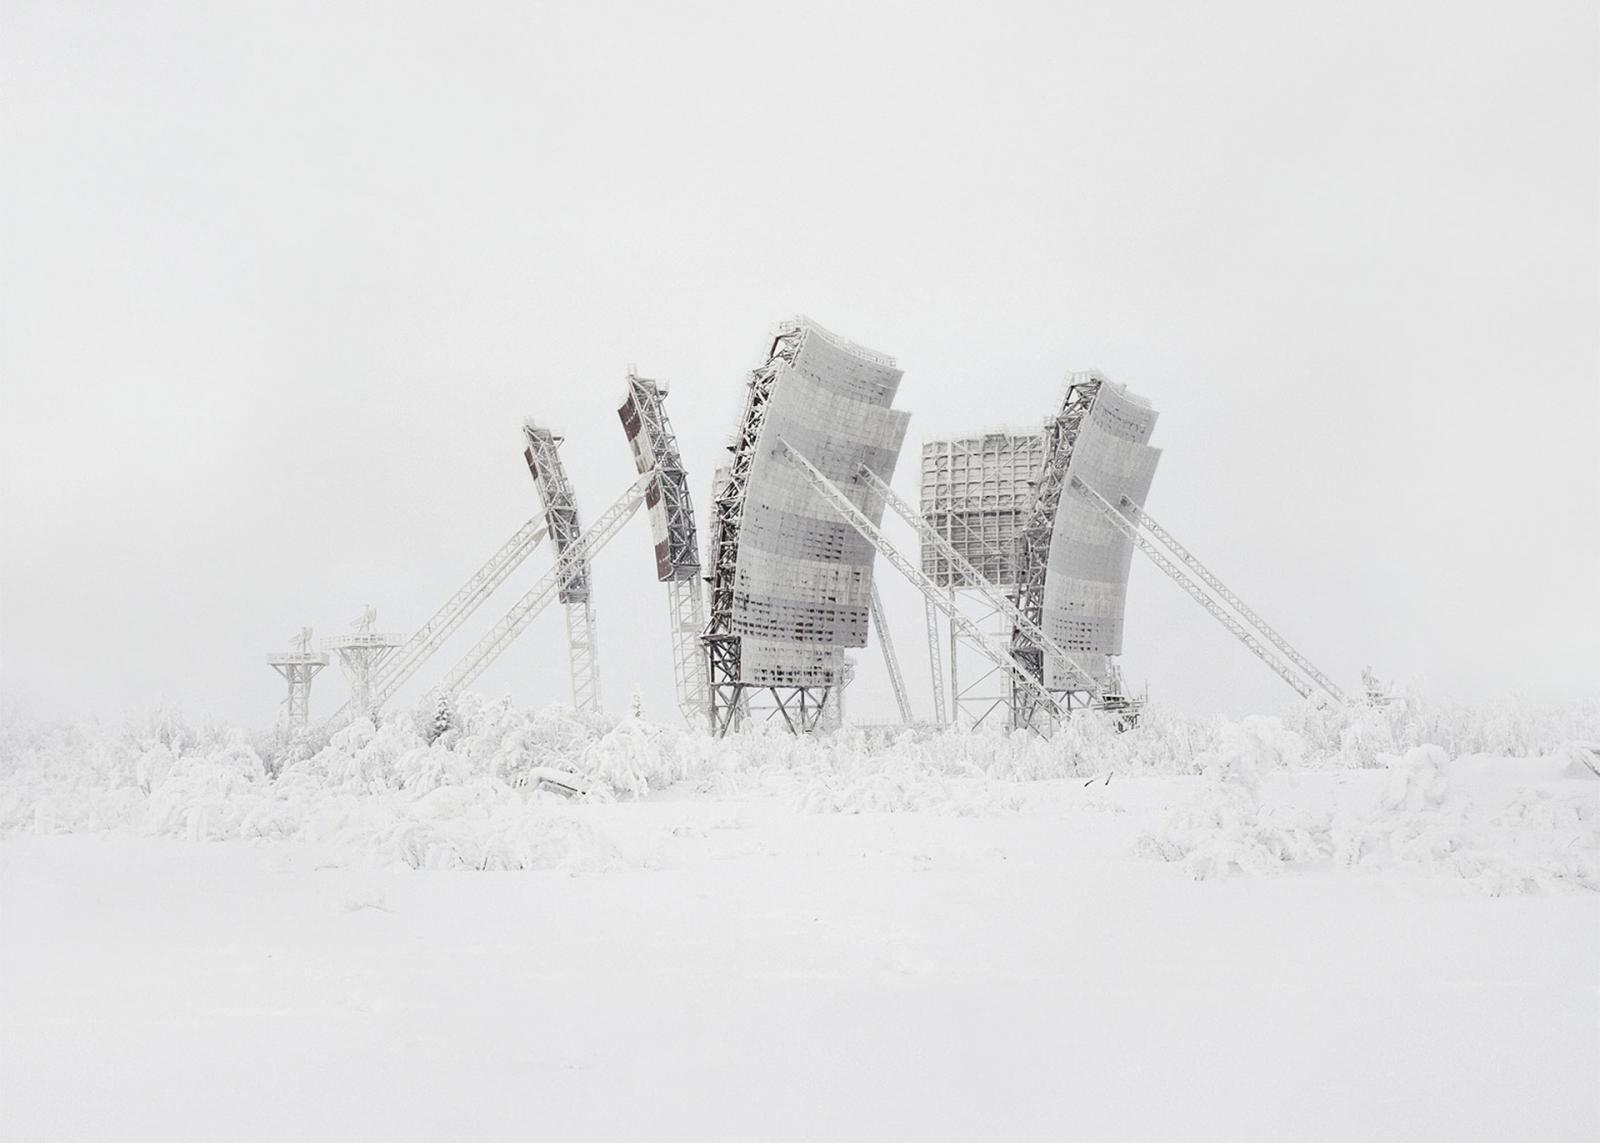 Power and Architecture: выставочный сезон фонда Calvert 22